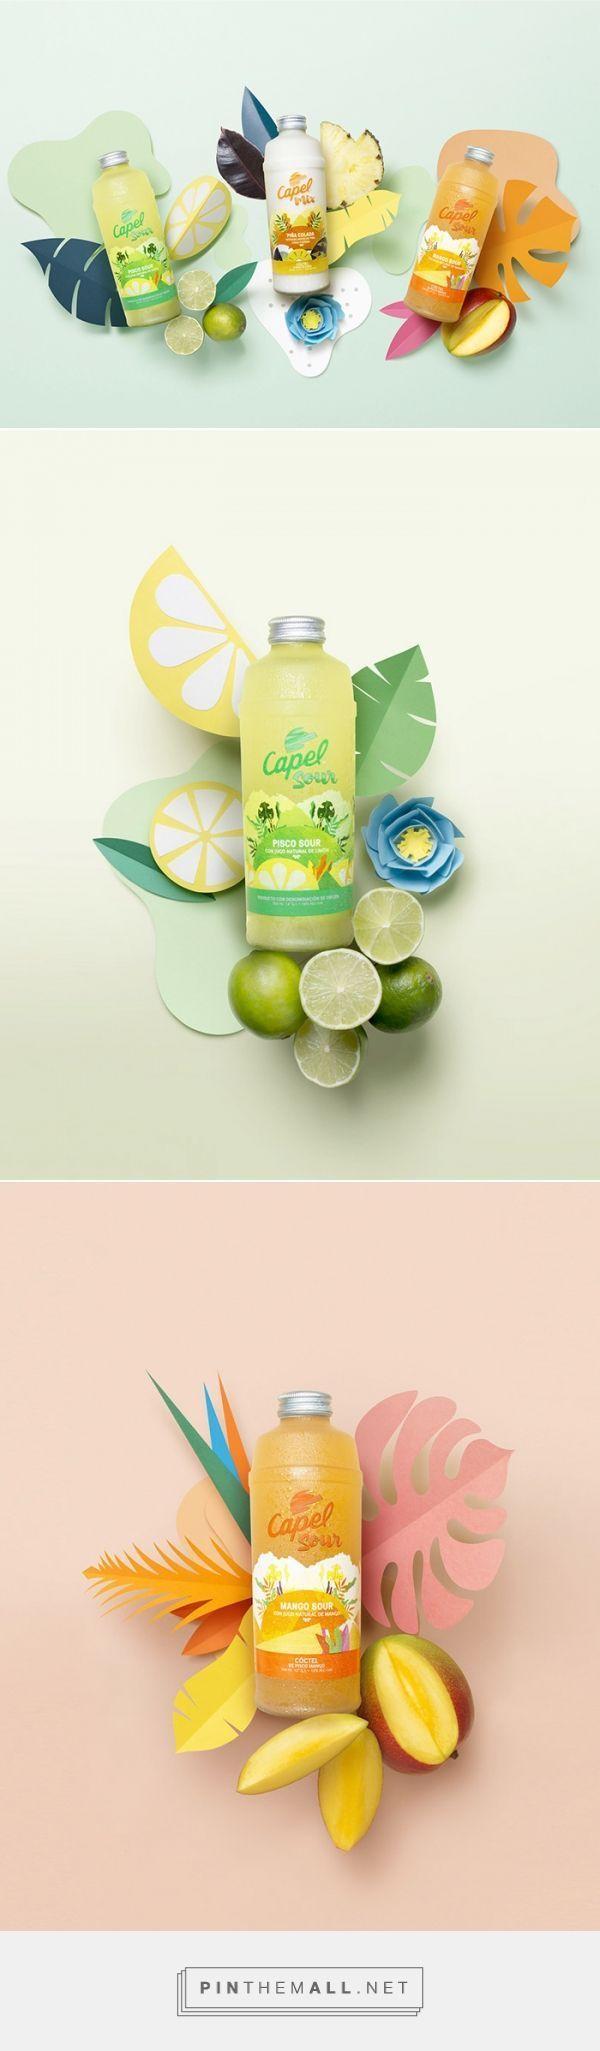 Capel Sour juices by Estudio Cielo. Source: Daily Package Design Inspiration.